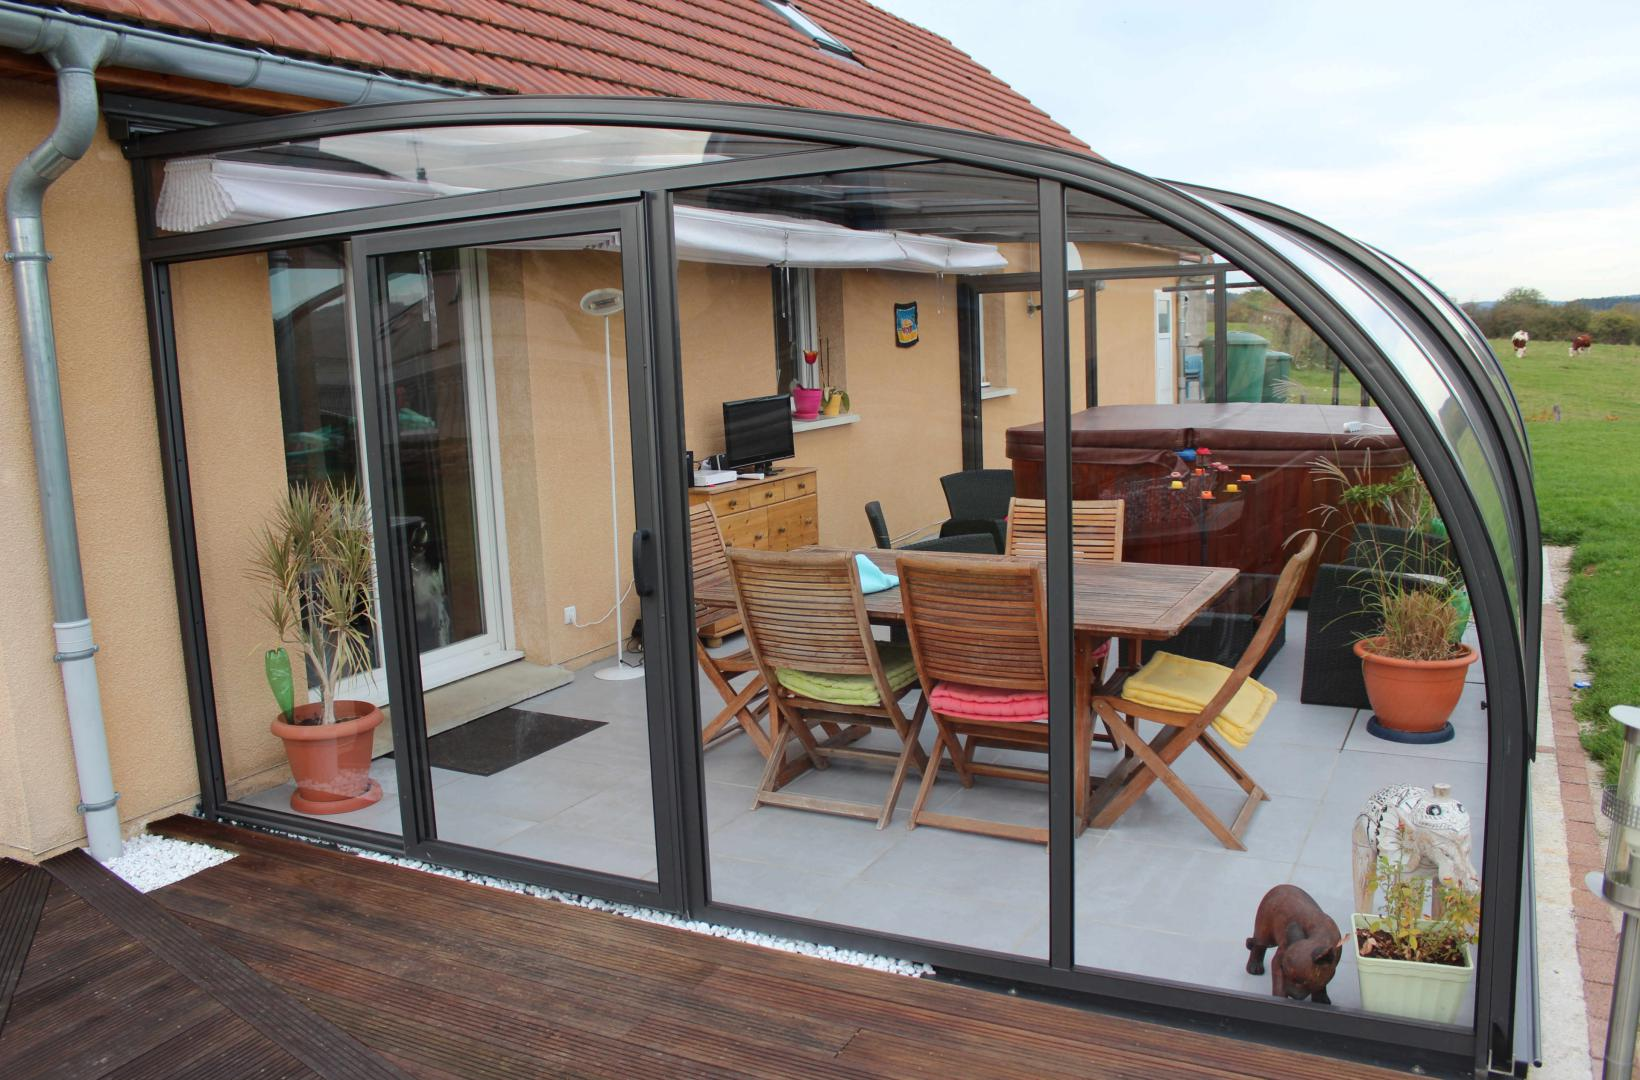 Abri de terrasse mod le saphir au galbe arrondi la solar - Modeles de verandas sur terrasse ...